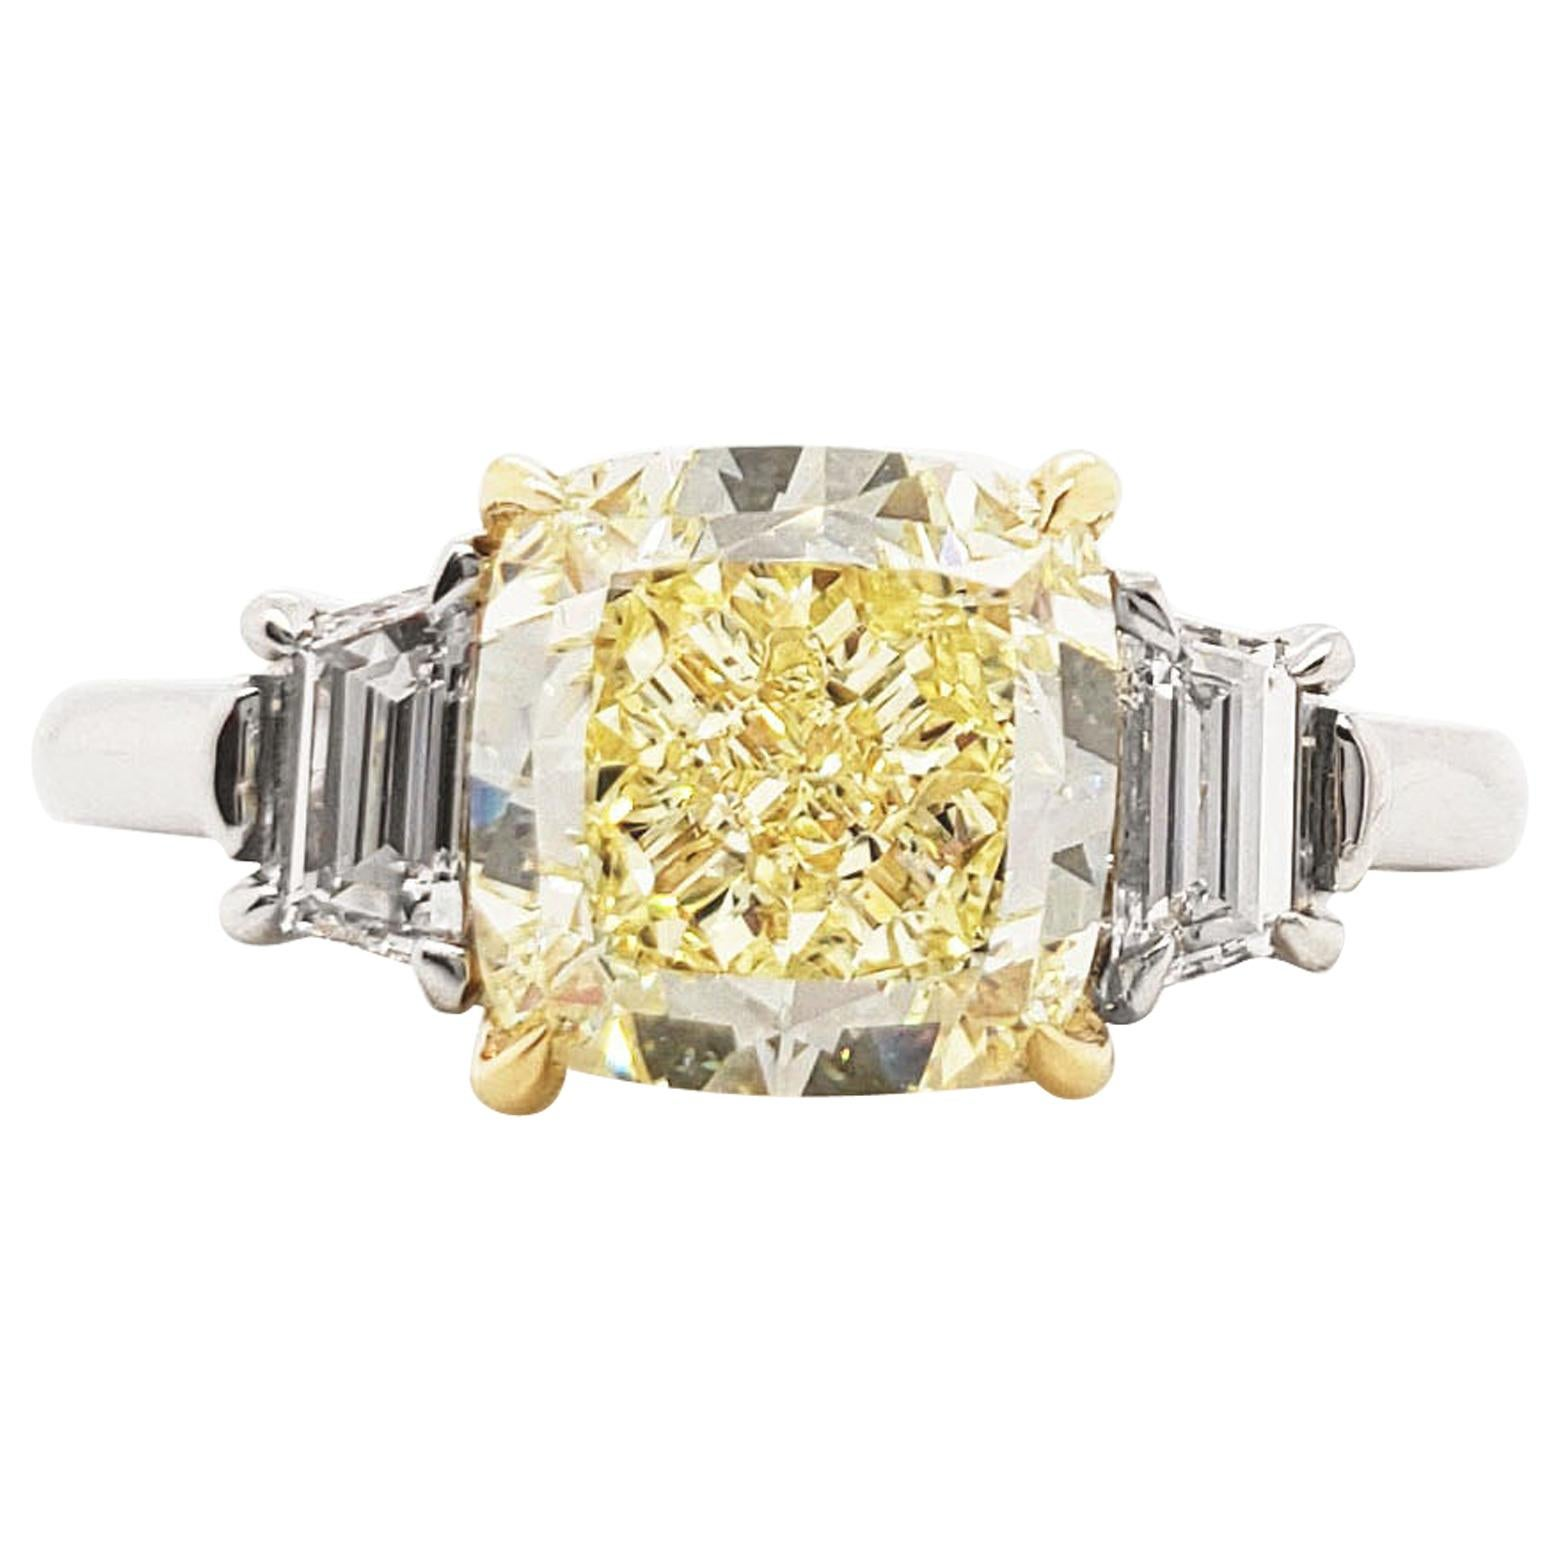 Scarselli 3 Carat Fancy Light Yellow VVS2 Diamond Engagement Ring, Platinum GIA